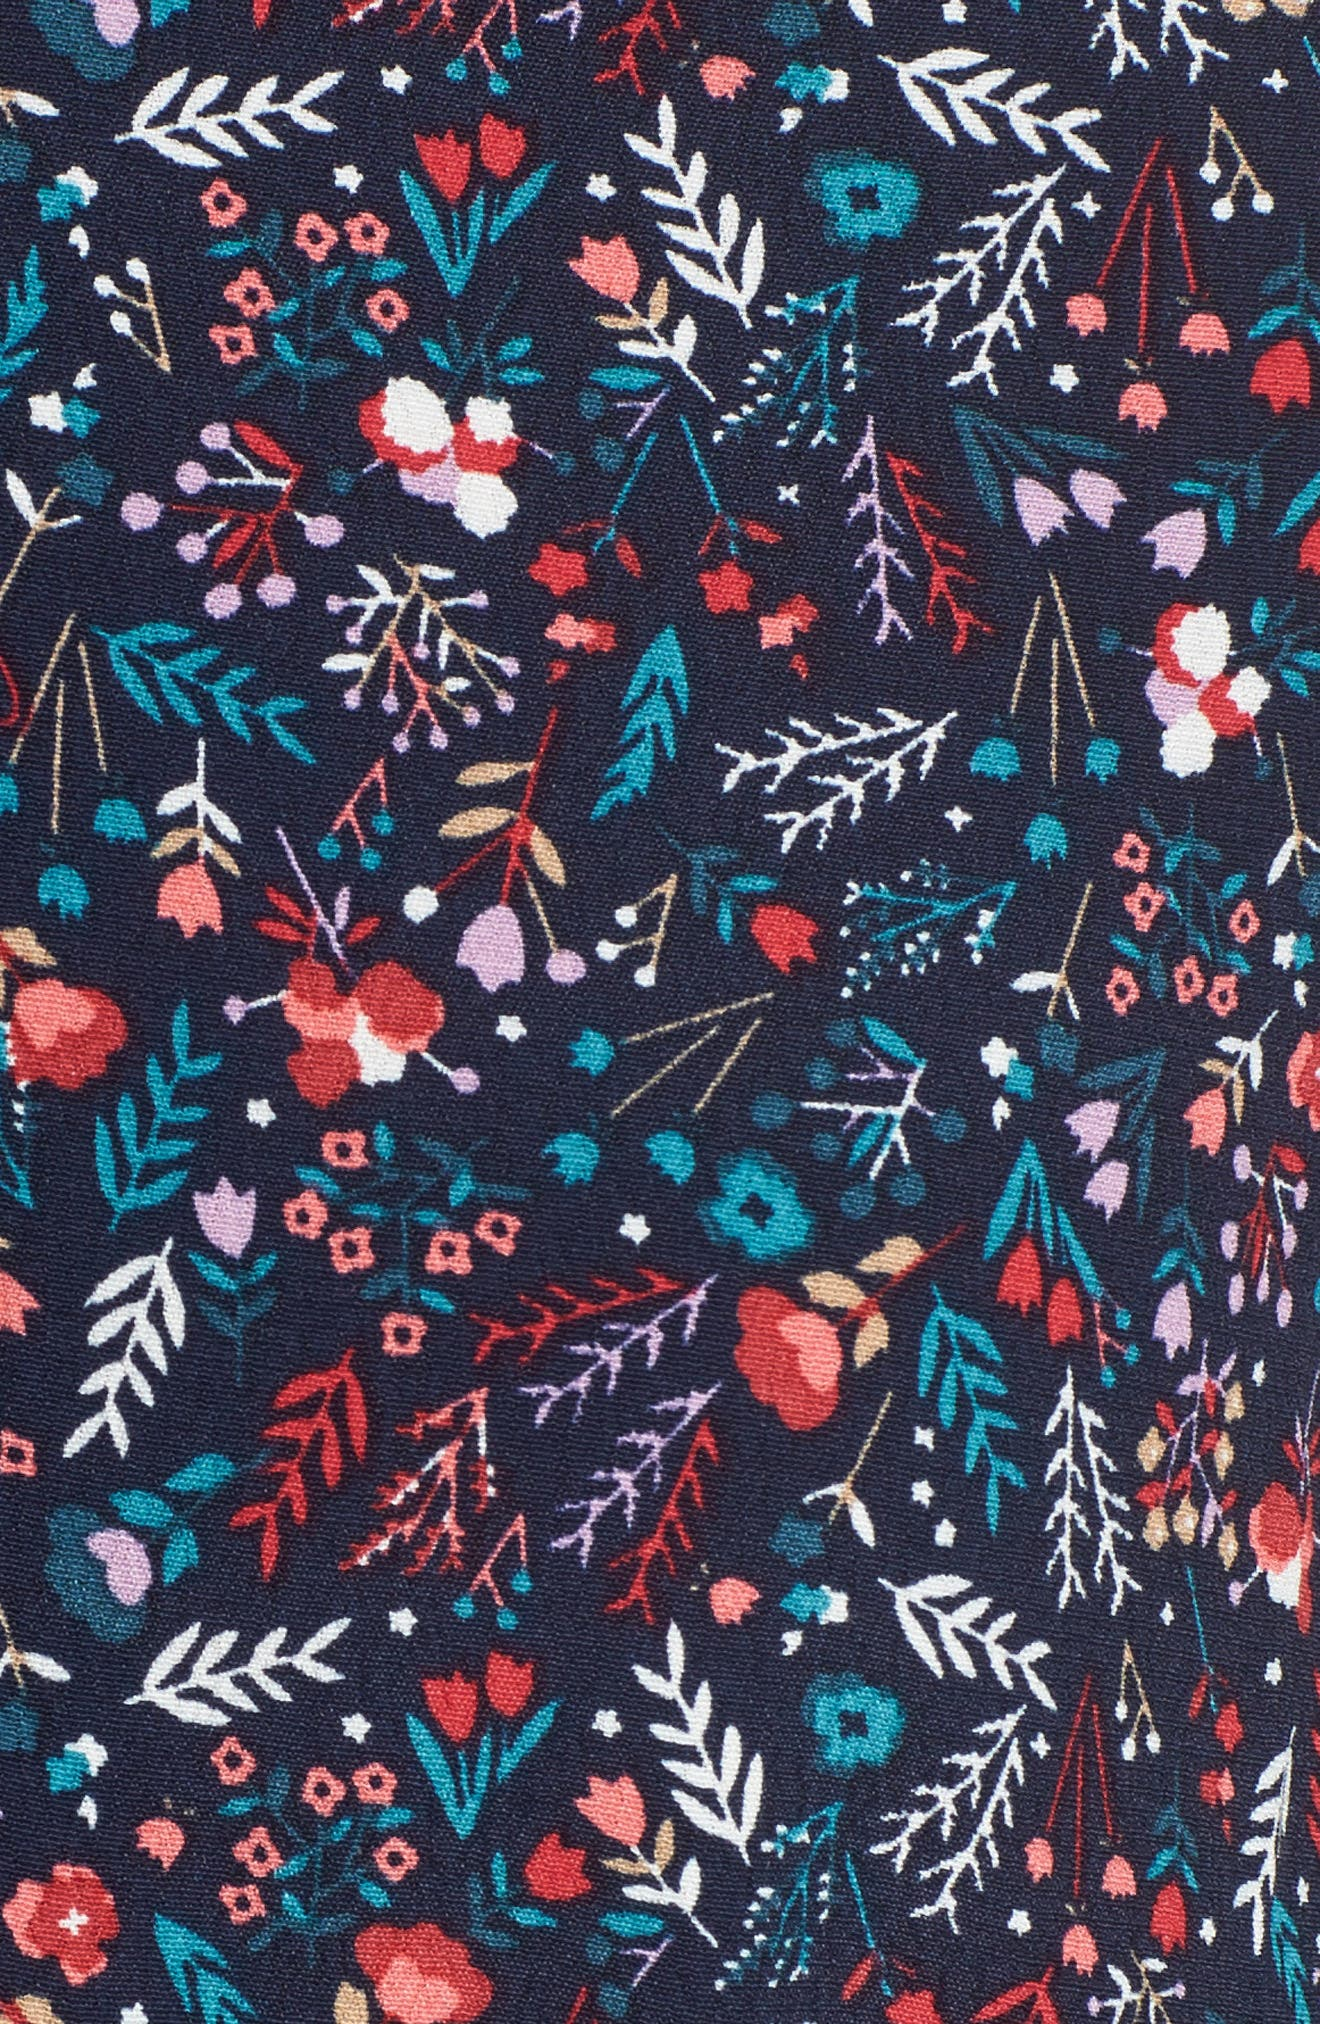 Caprice Floral Mix Shirtdress,                             Alternate thumbnail 5, color,                             Regal Caprice